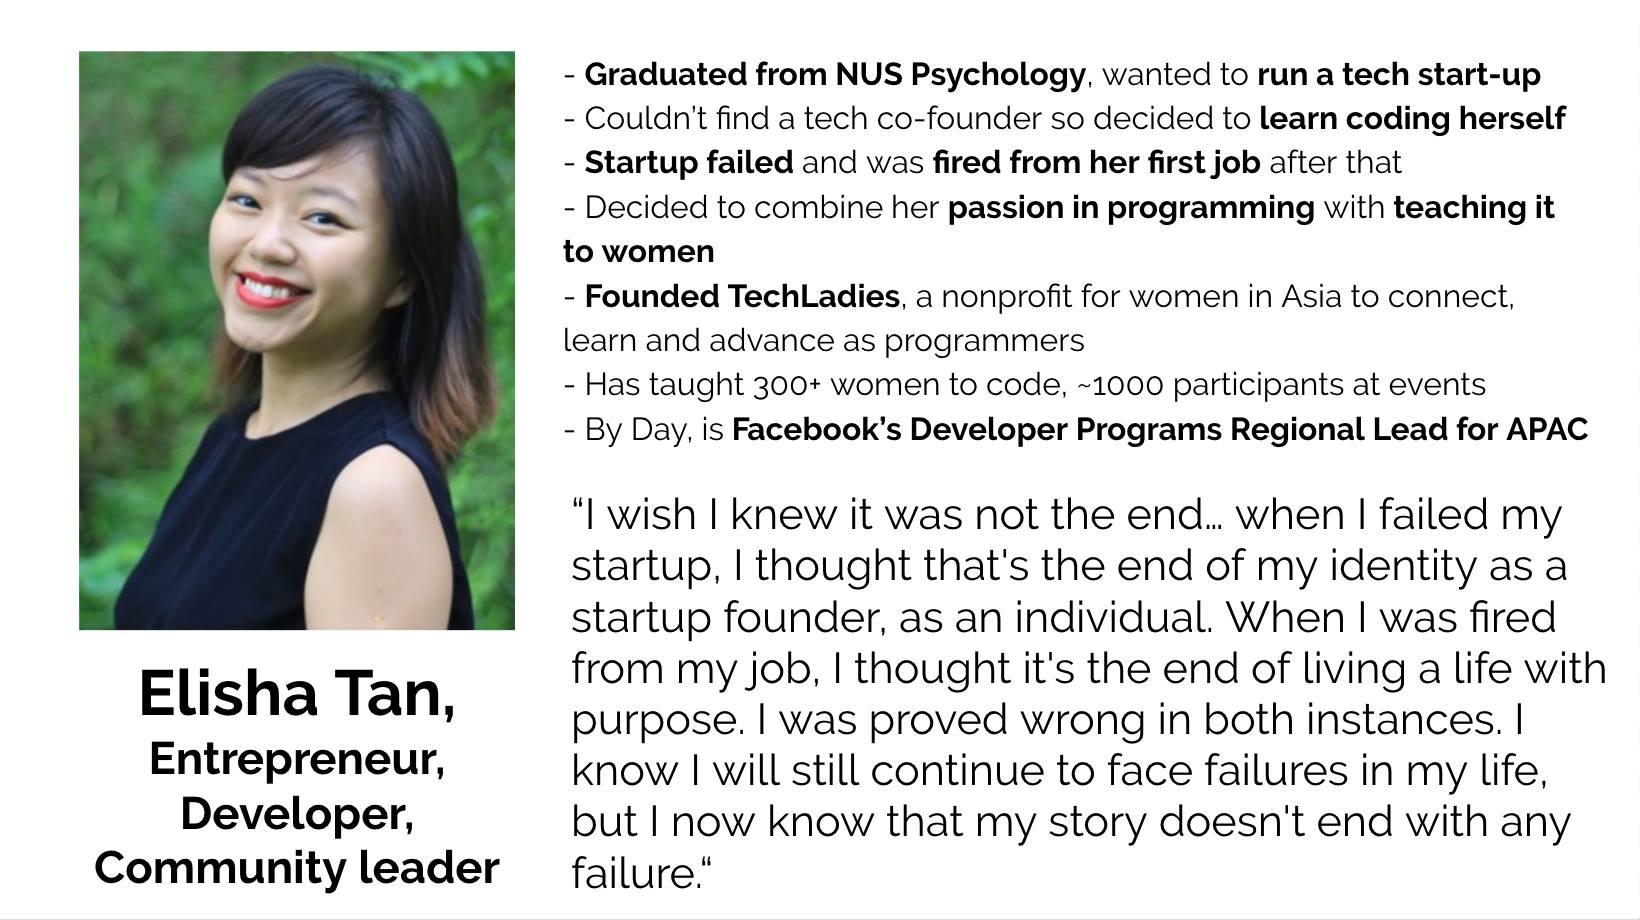 Elisha Tan, TechLadies, Developer Progams Regional Lead for APAC, Facebook